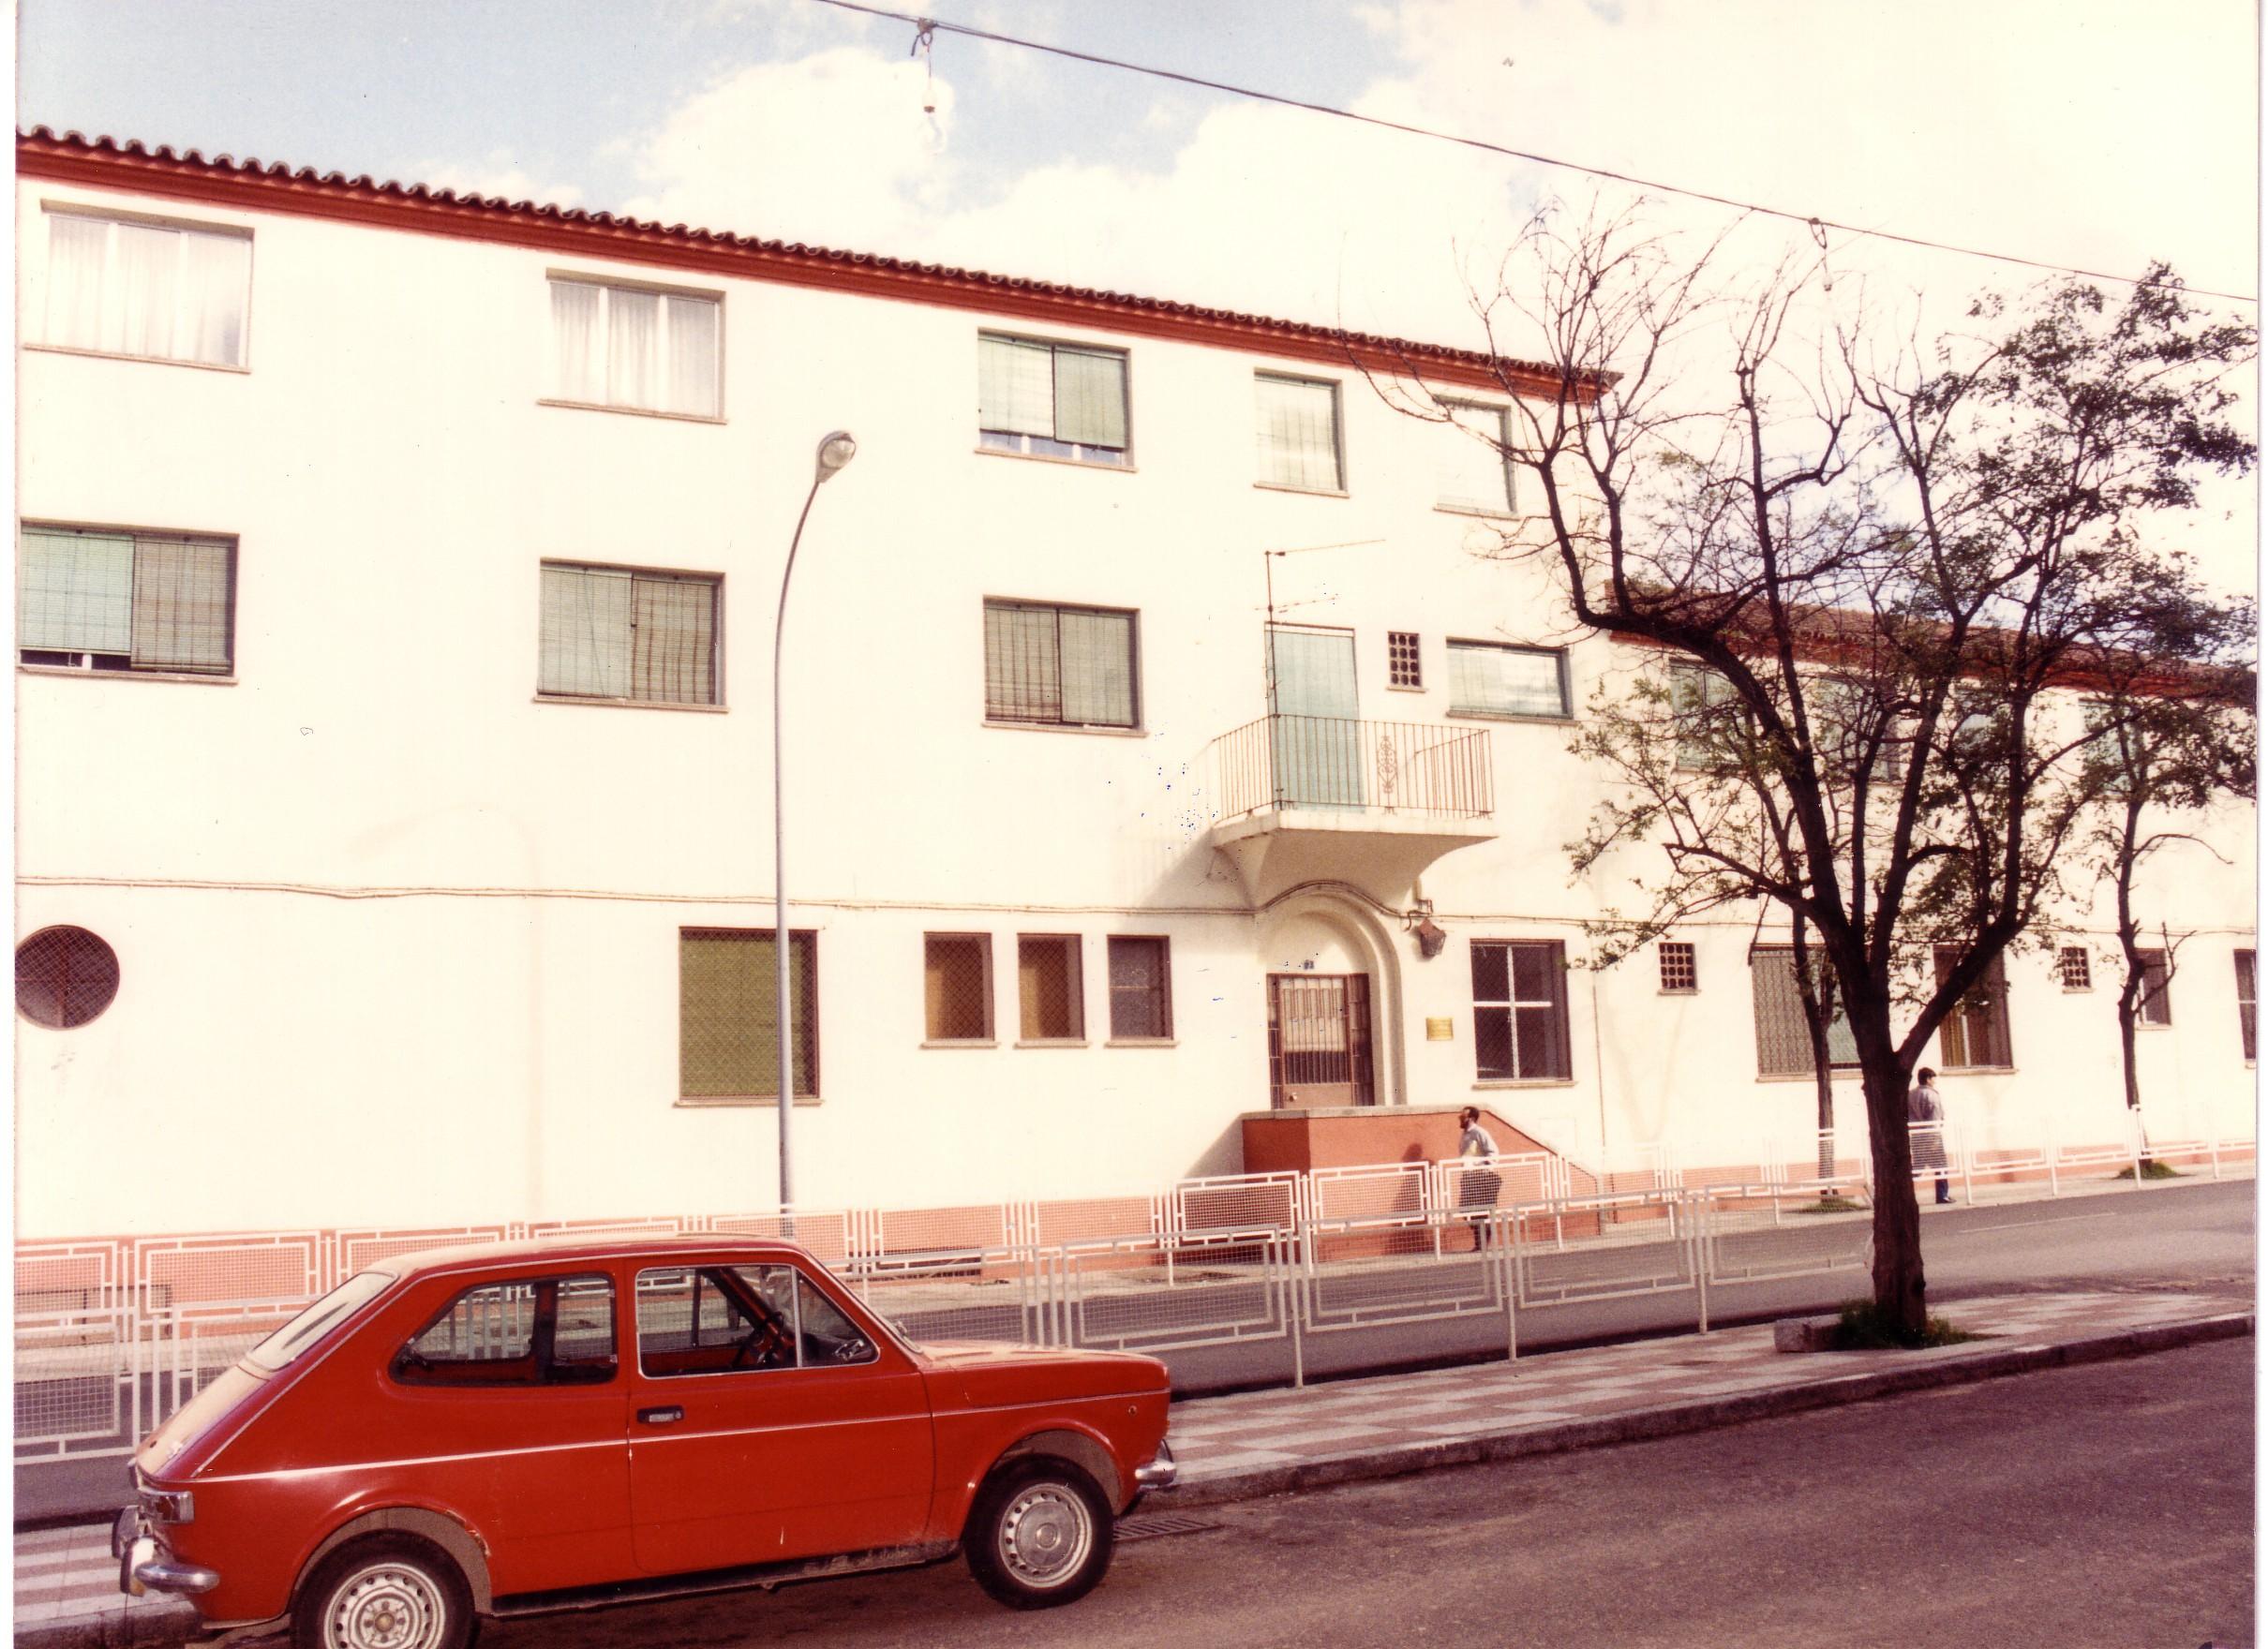 Hogar Infantil 1986. Archivo F. Negrete